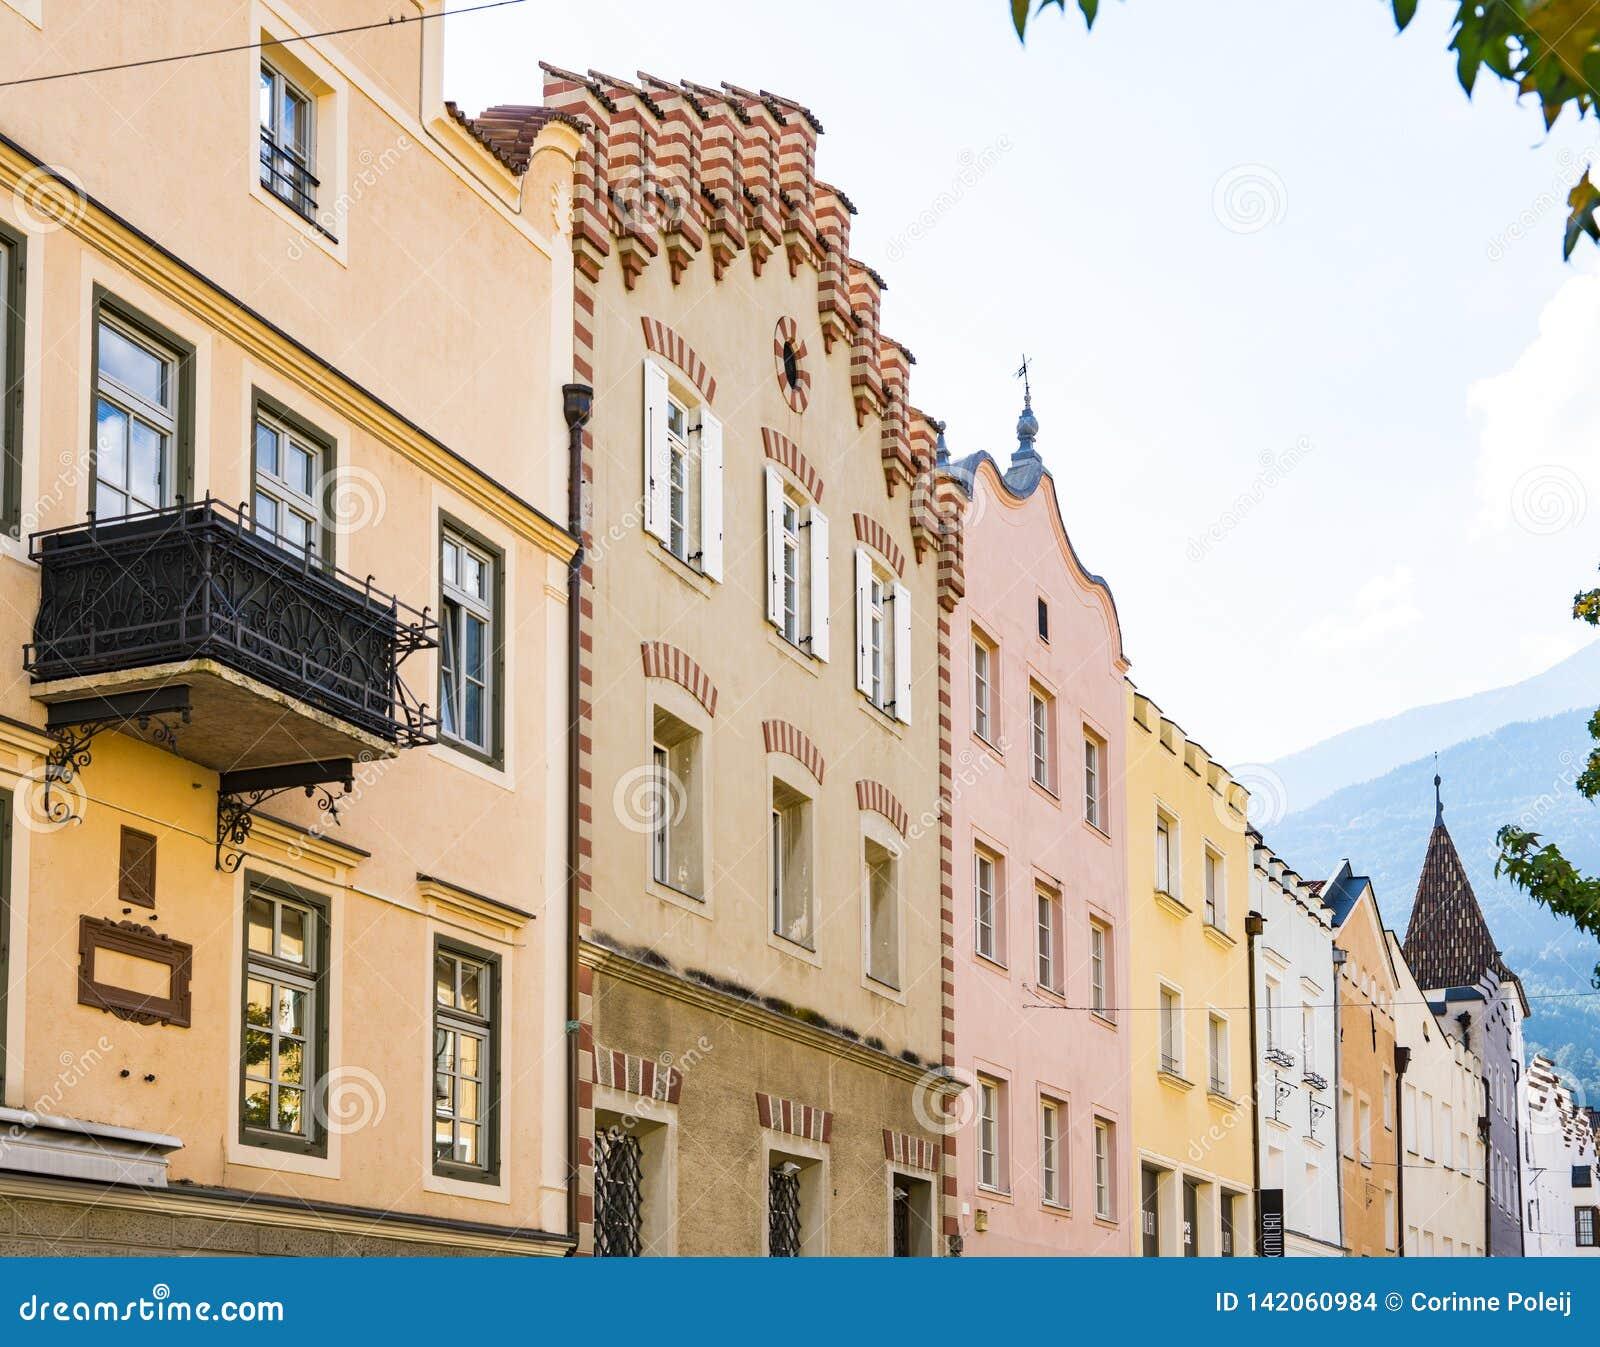 Casas coloridas em Bressanone Brixen, Itália